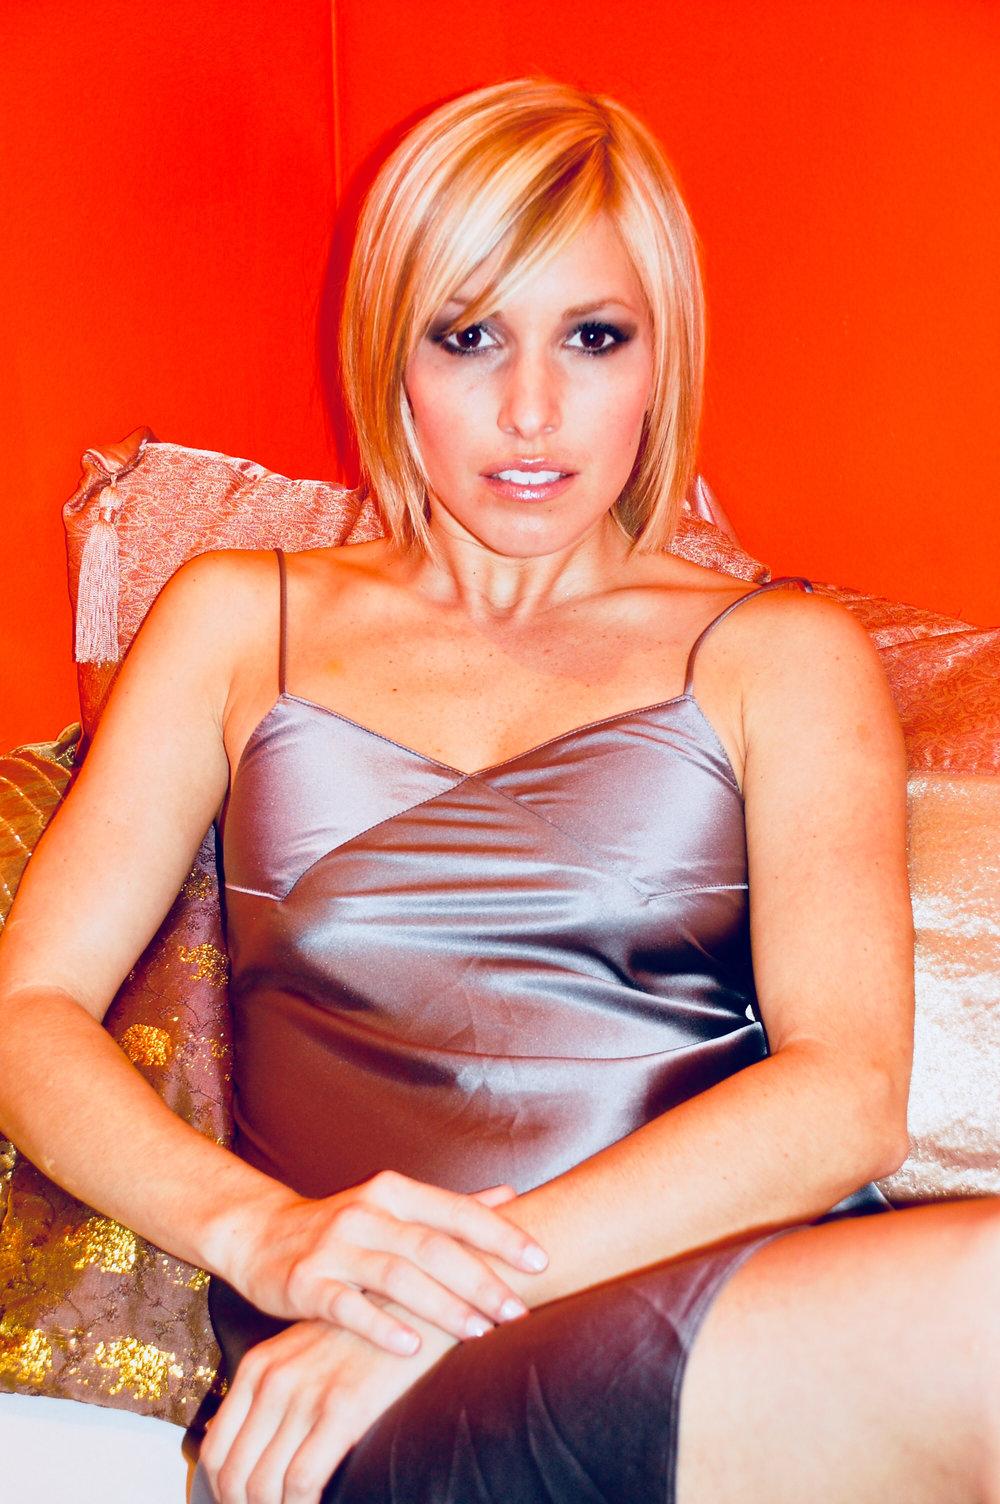 Blonde atl model.jpg